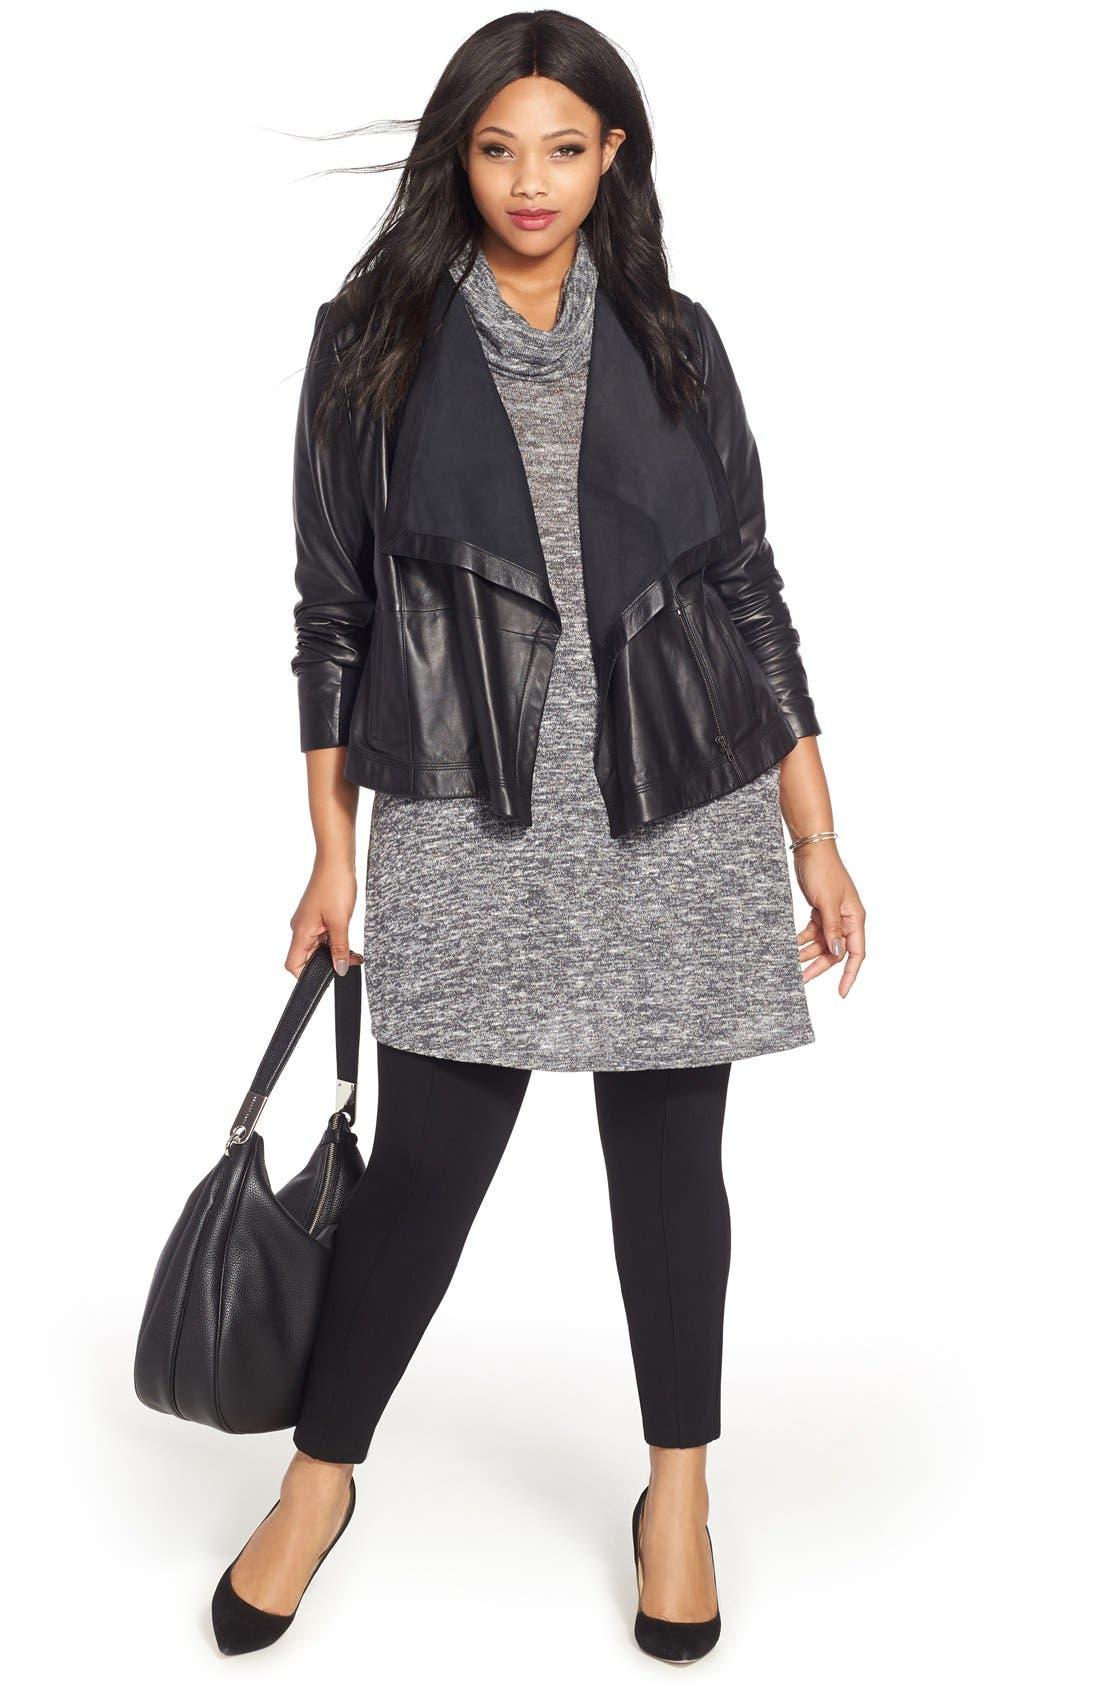 Sejour Leather Jacket, Tunic & Leggings (Plus Size)